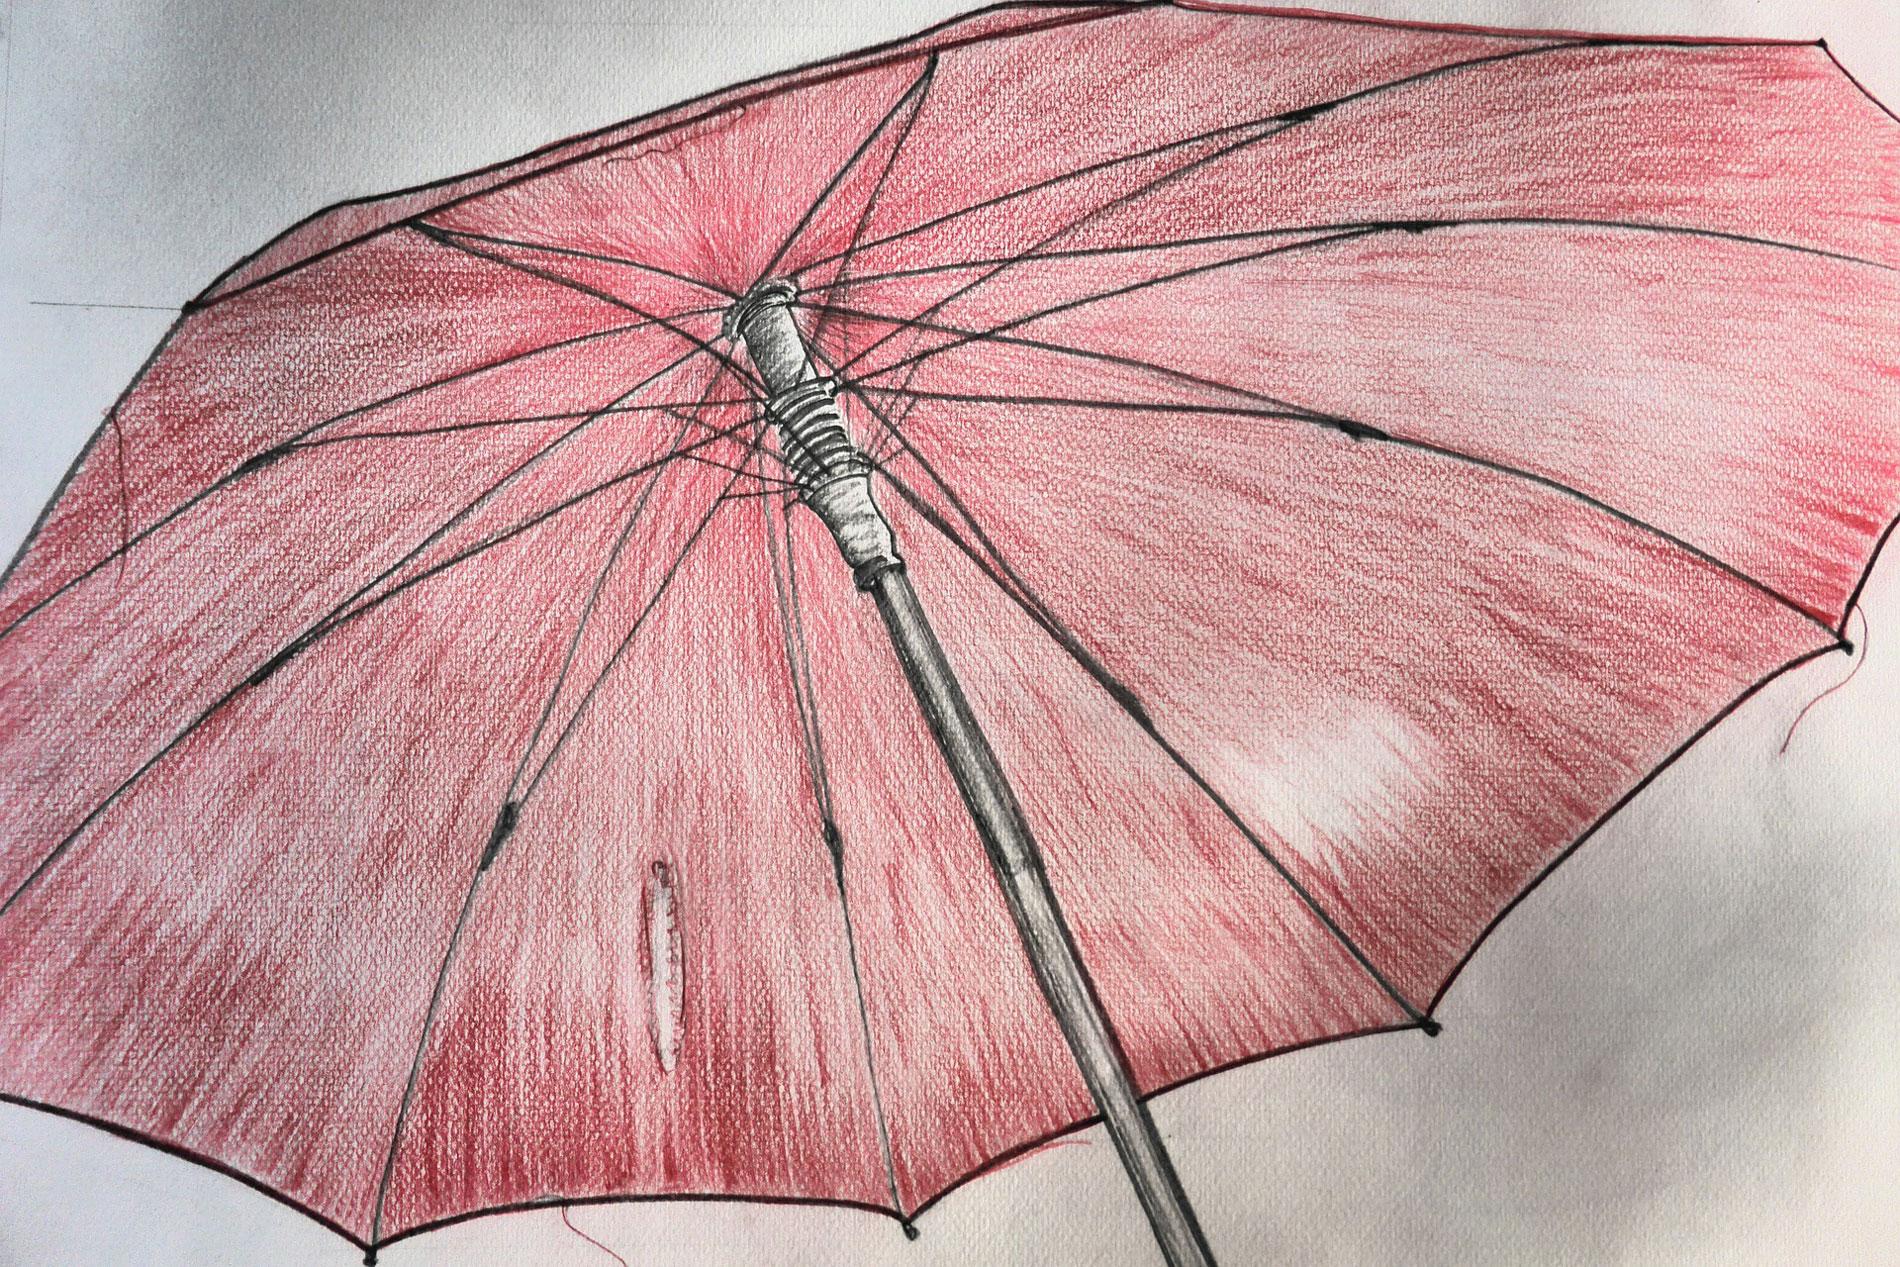 Umbrella Excess Liability Bluehill Insurance